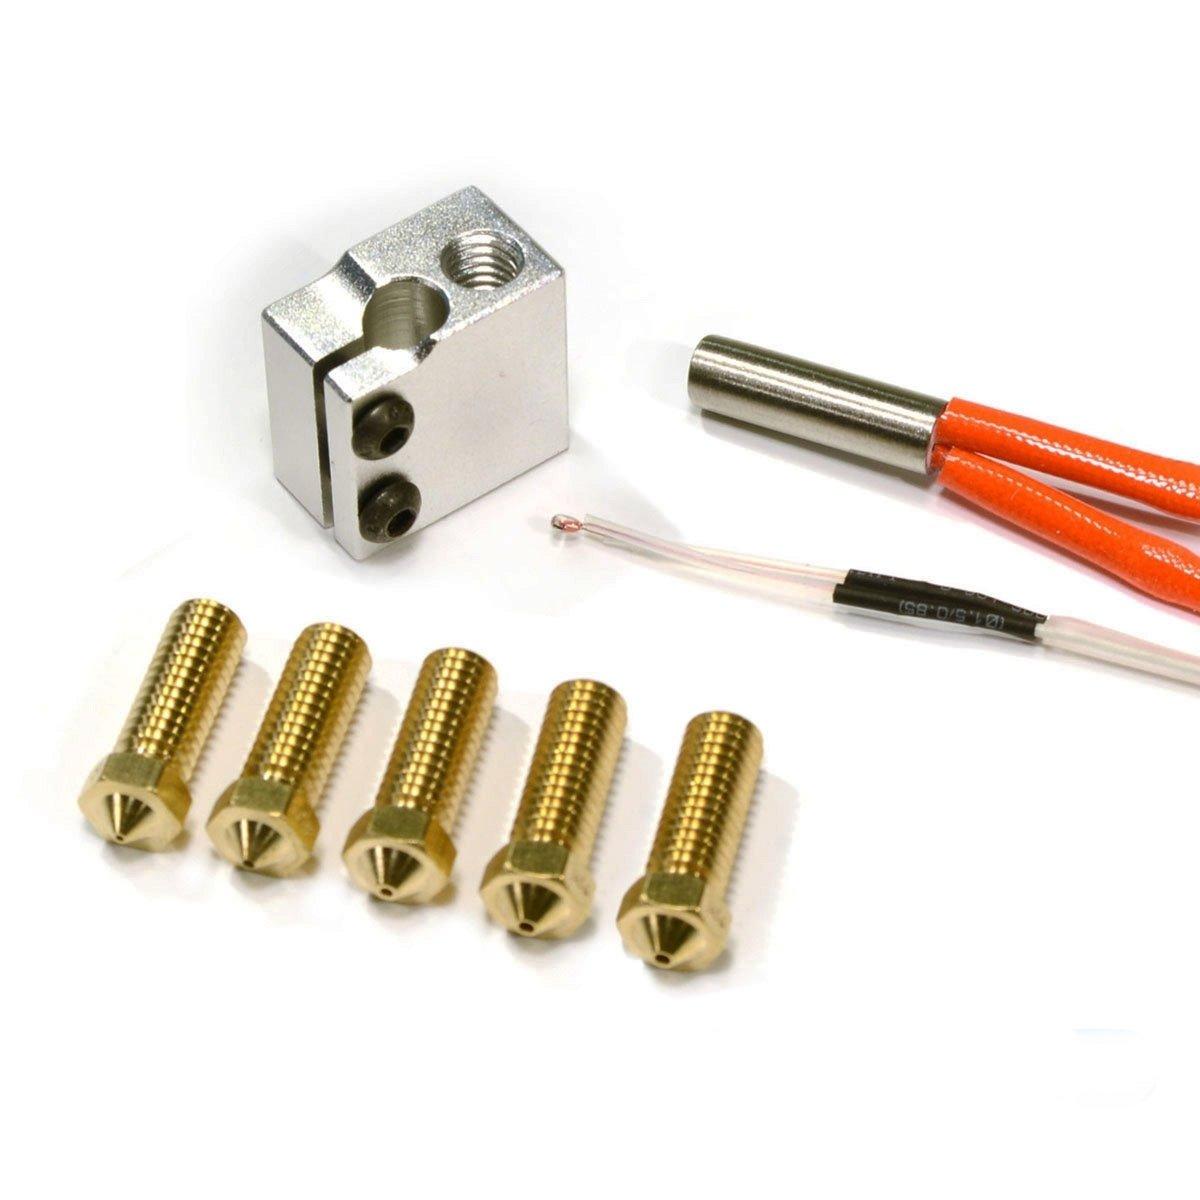 Gulfcoast Robotics 12V Heater and Thermistor. 5 nozzles RepRap 3D Printer High Print Speed Print Pack 1.75mm Filament